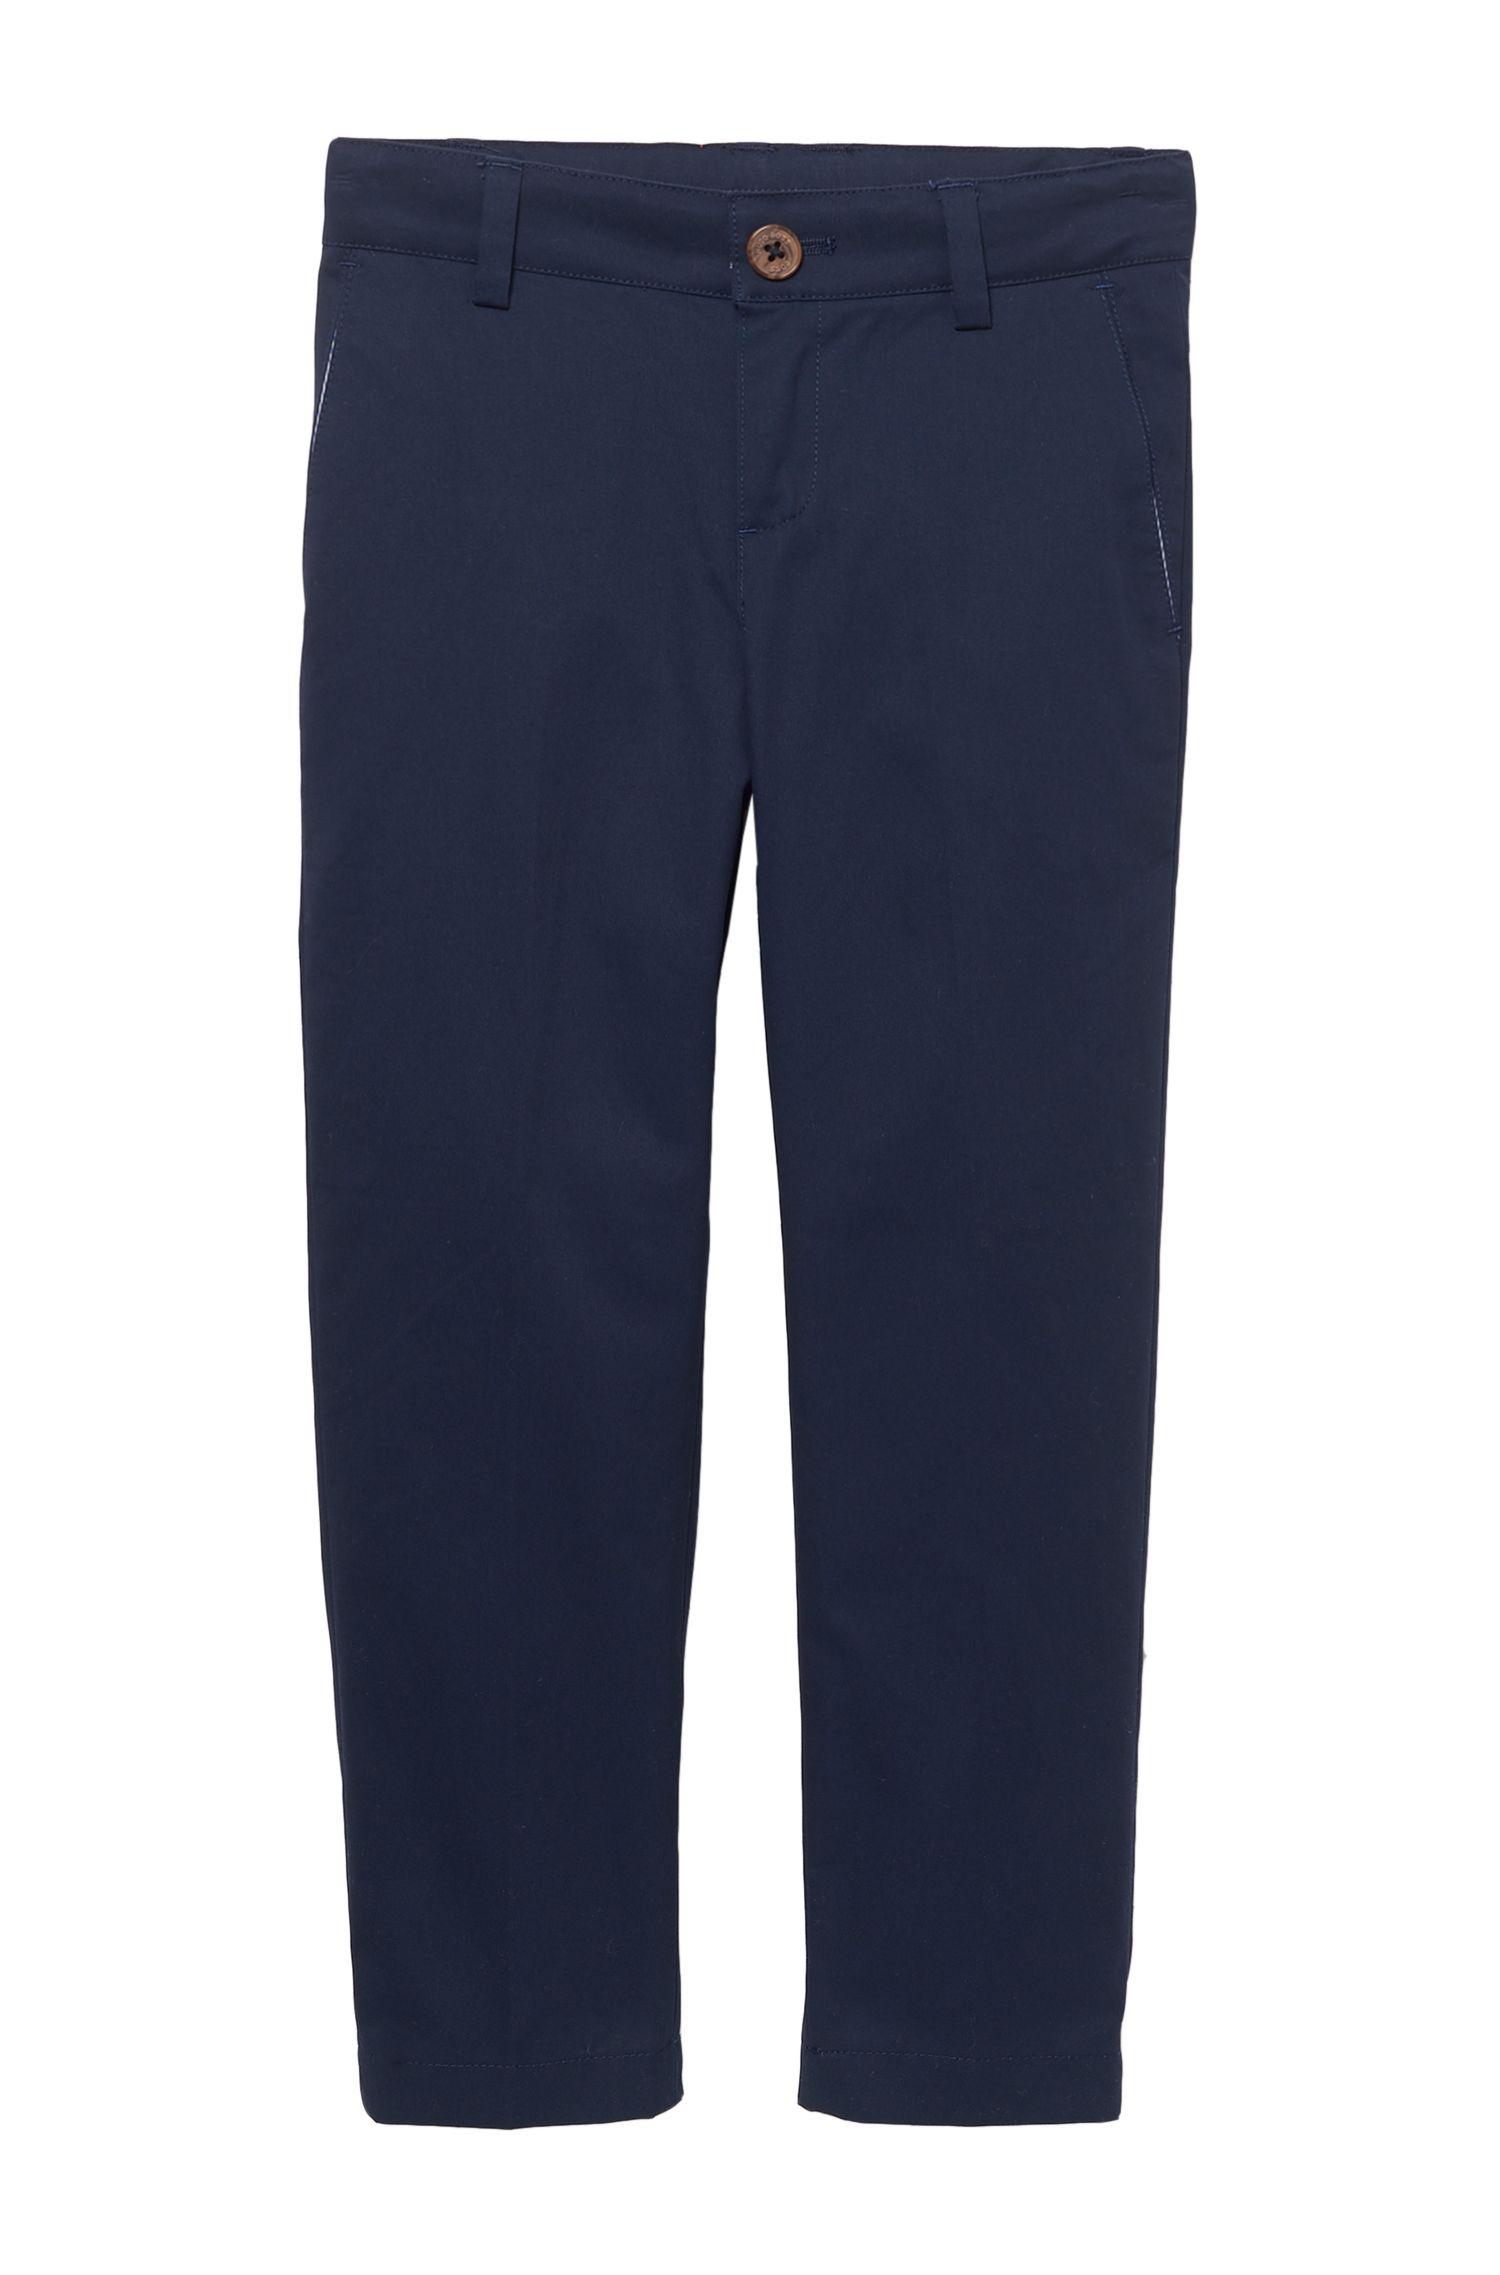 'J24399' | Boys Stretch Cotton Trousers